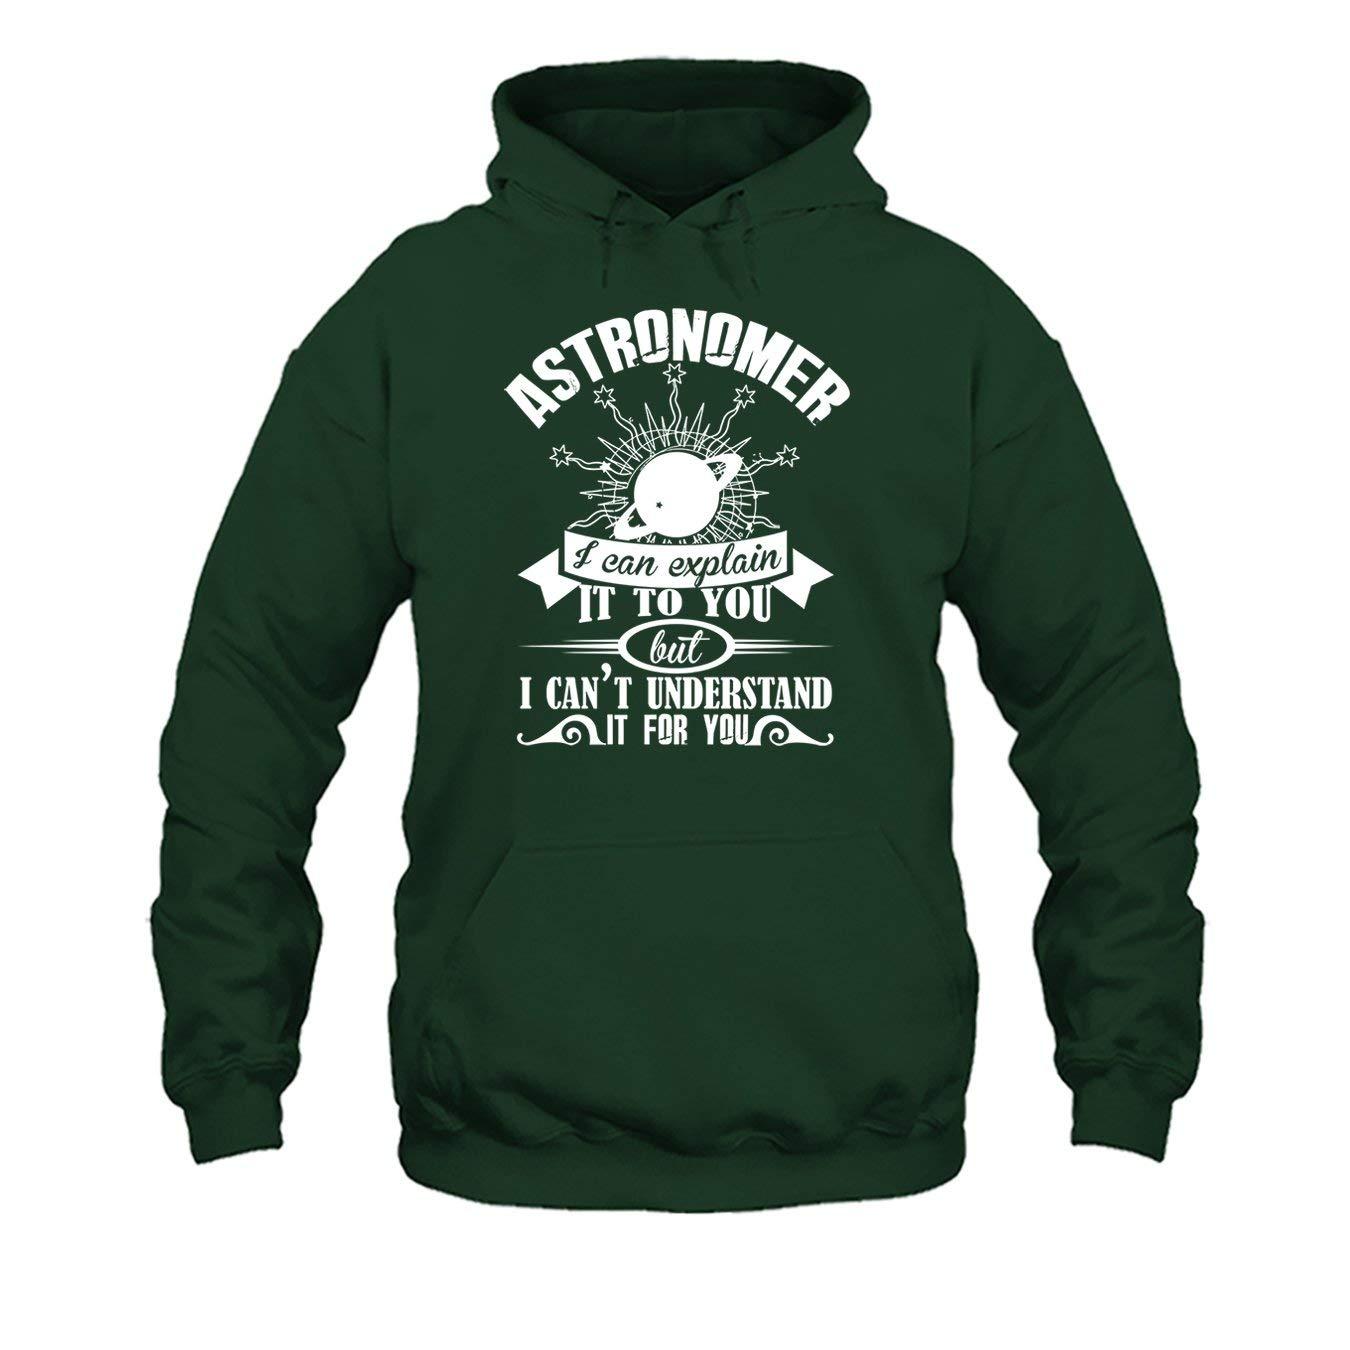 Hoodies Shirt Sheep Fly Astronomer Job Tee Shirt